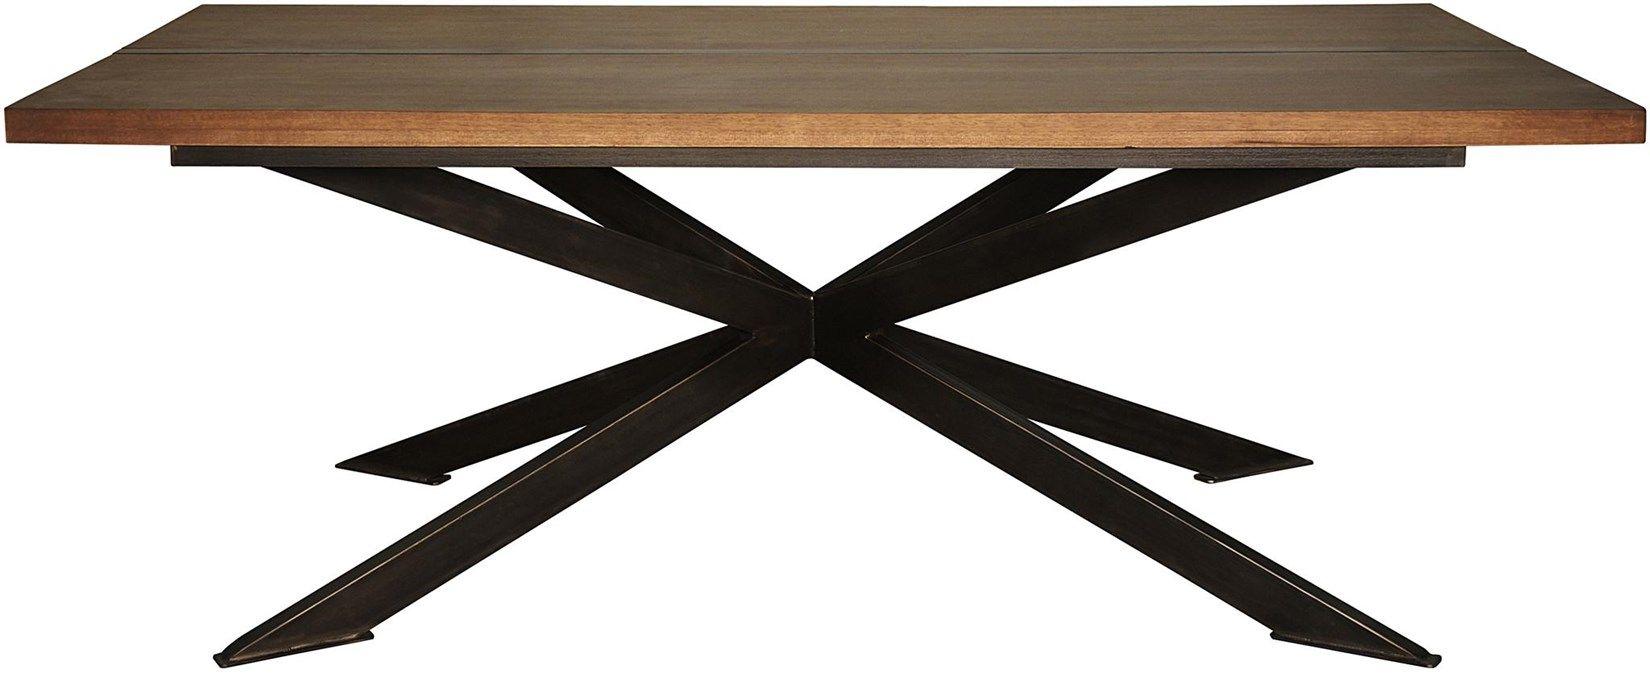 :: NOIR :: GTAB481MT Lazio Dining Table W 84 D 44 H 30 #7Foot